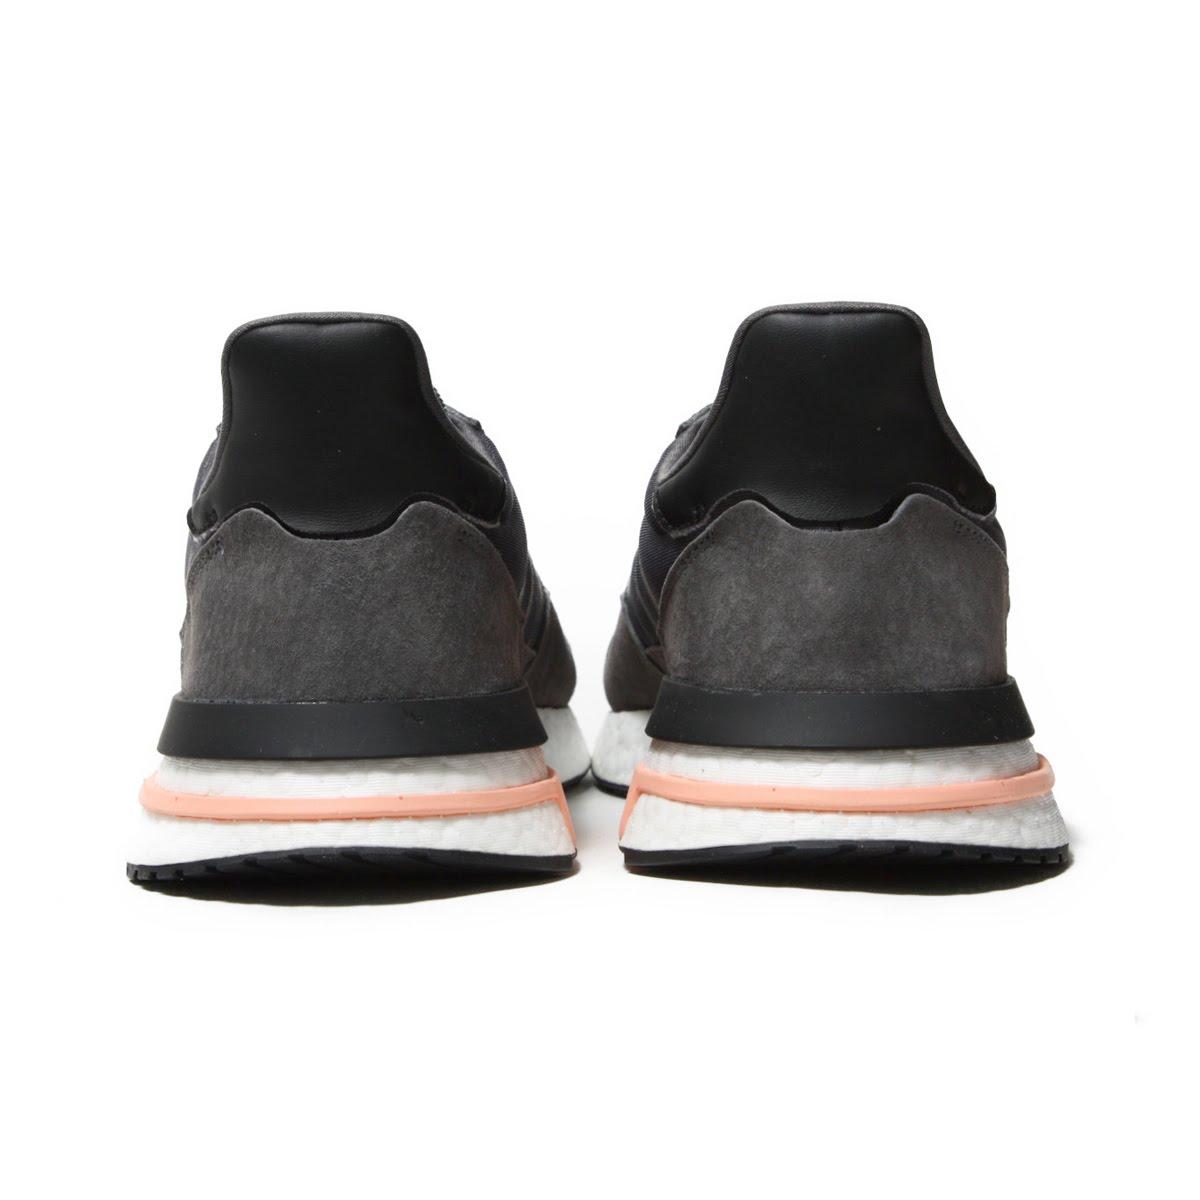 2222ab682accf adidas Originals ZX 500 RM (Adidas originals ZX 500 RM) Grey Five Running  White Clear Orange 18FW-I